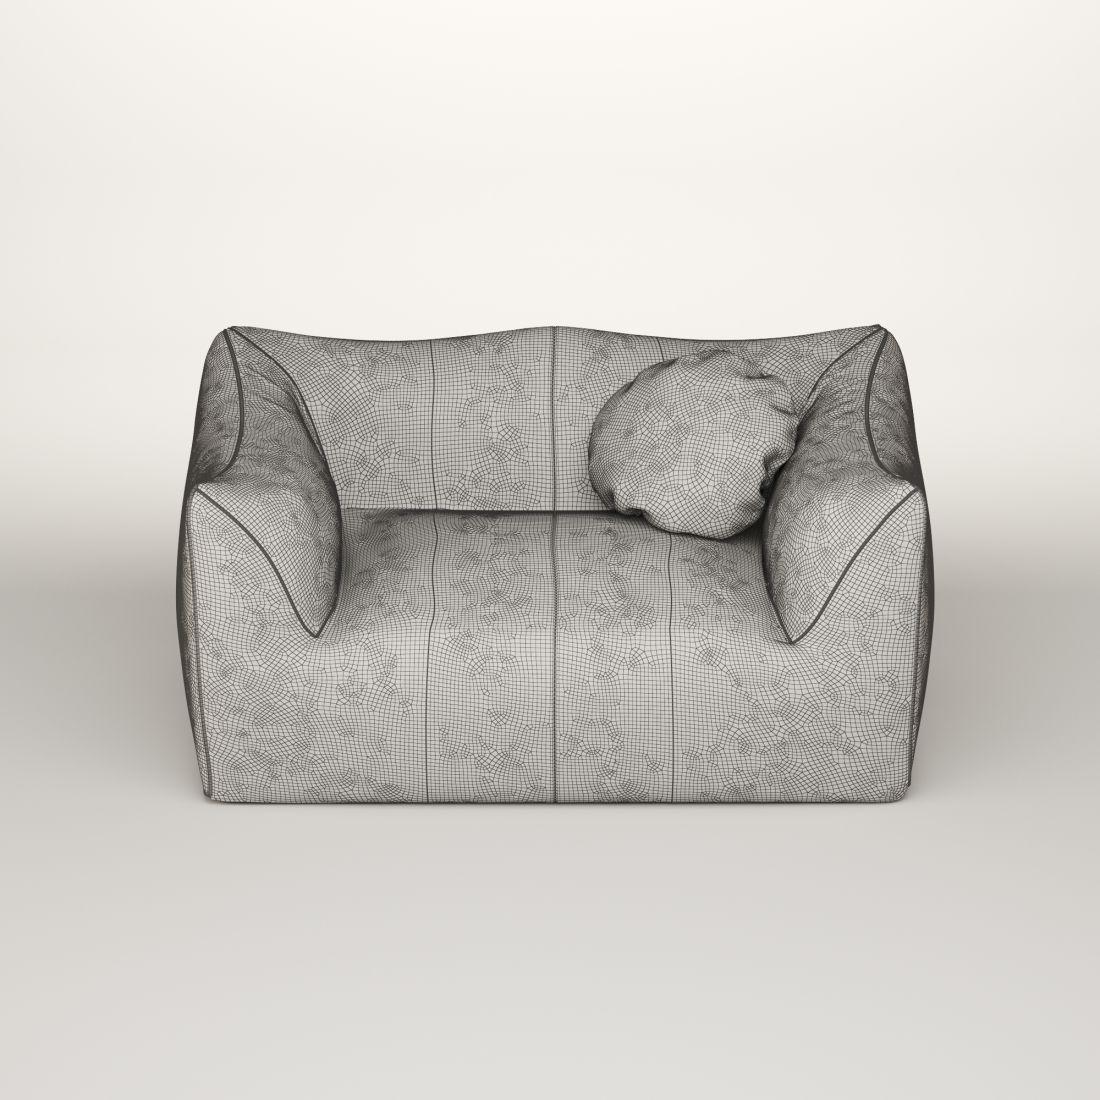 Mario Bellini Leather Sofa - 3D Model for VRay